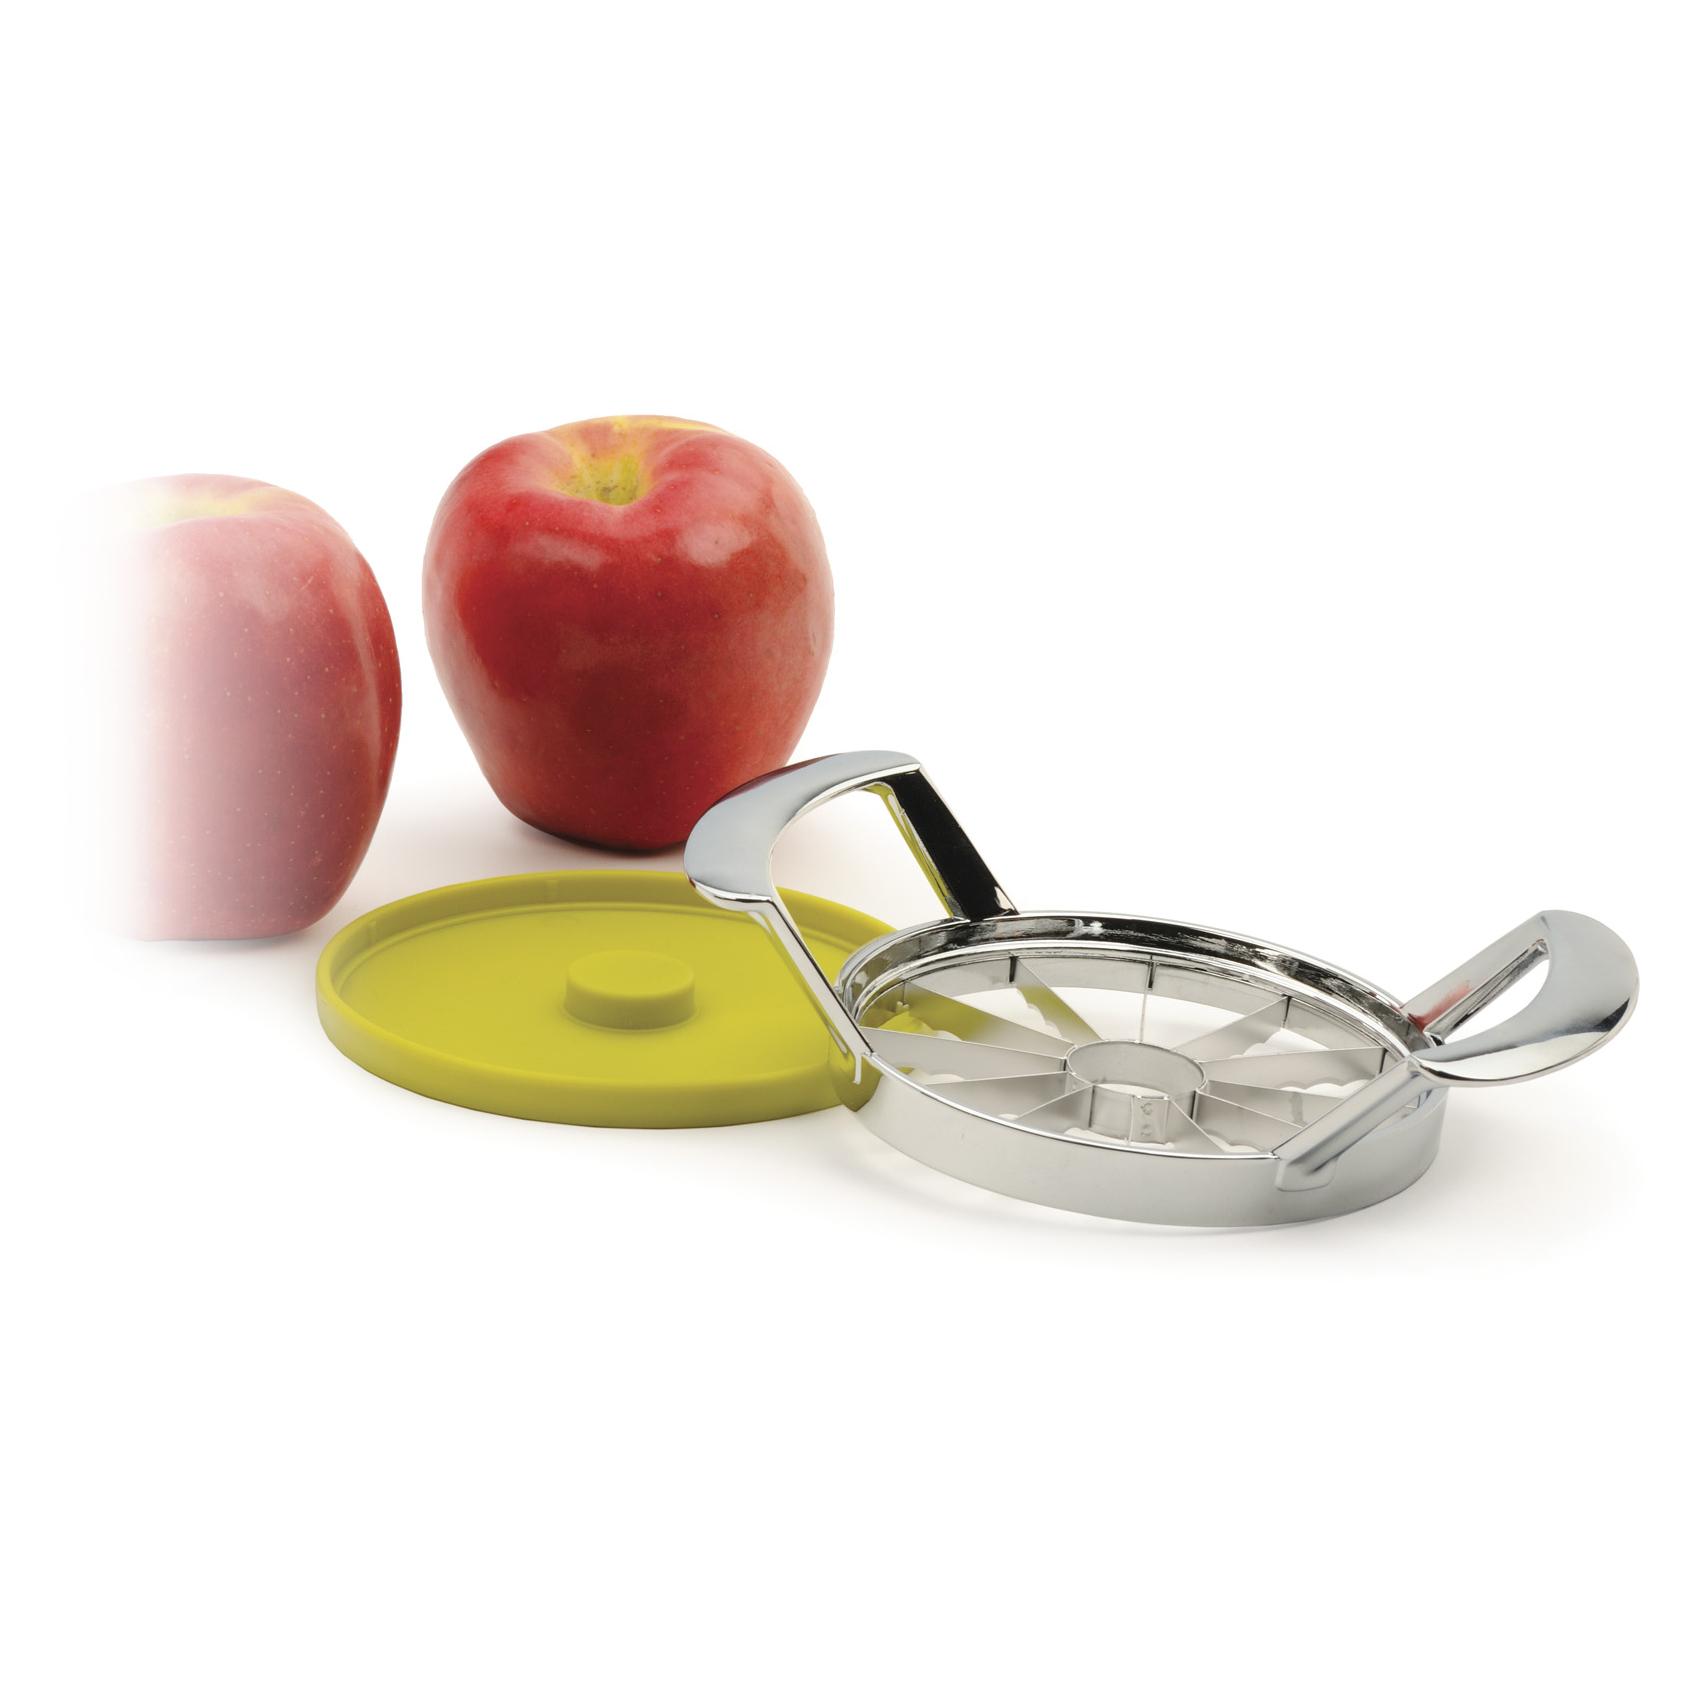 RSVP Classic Z-Gadget Green Jumbo Apple Slicer and Corer